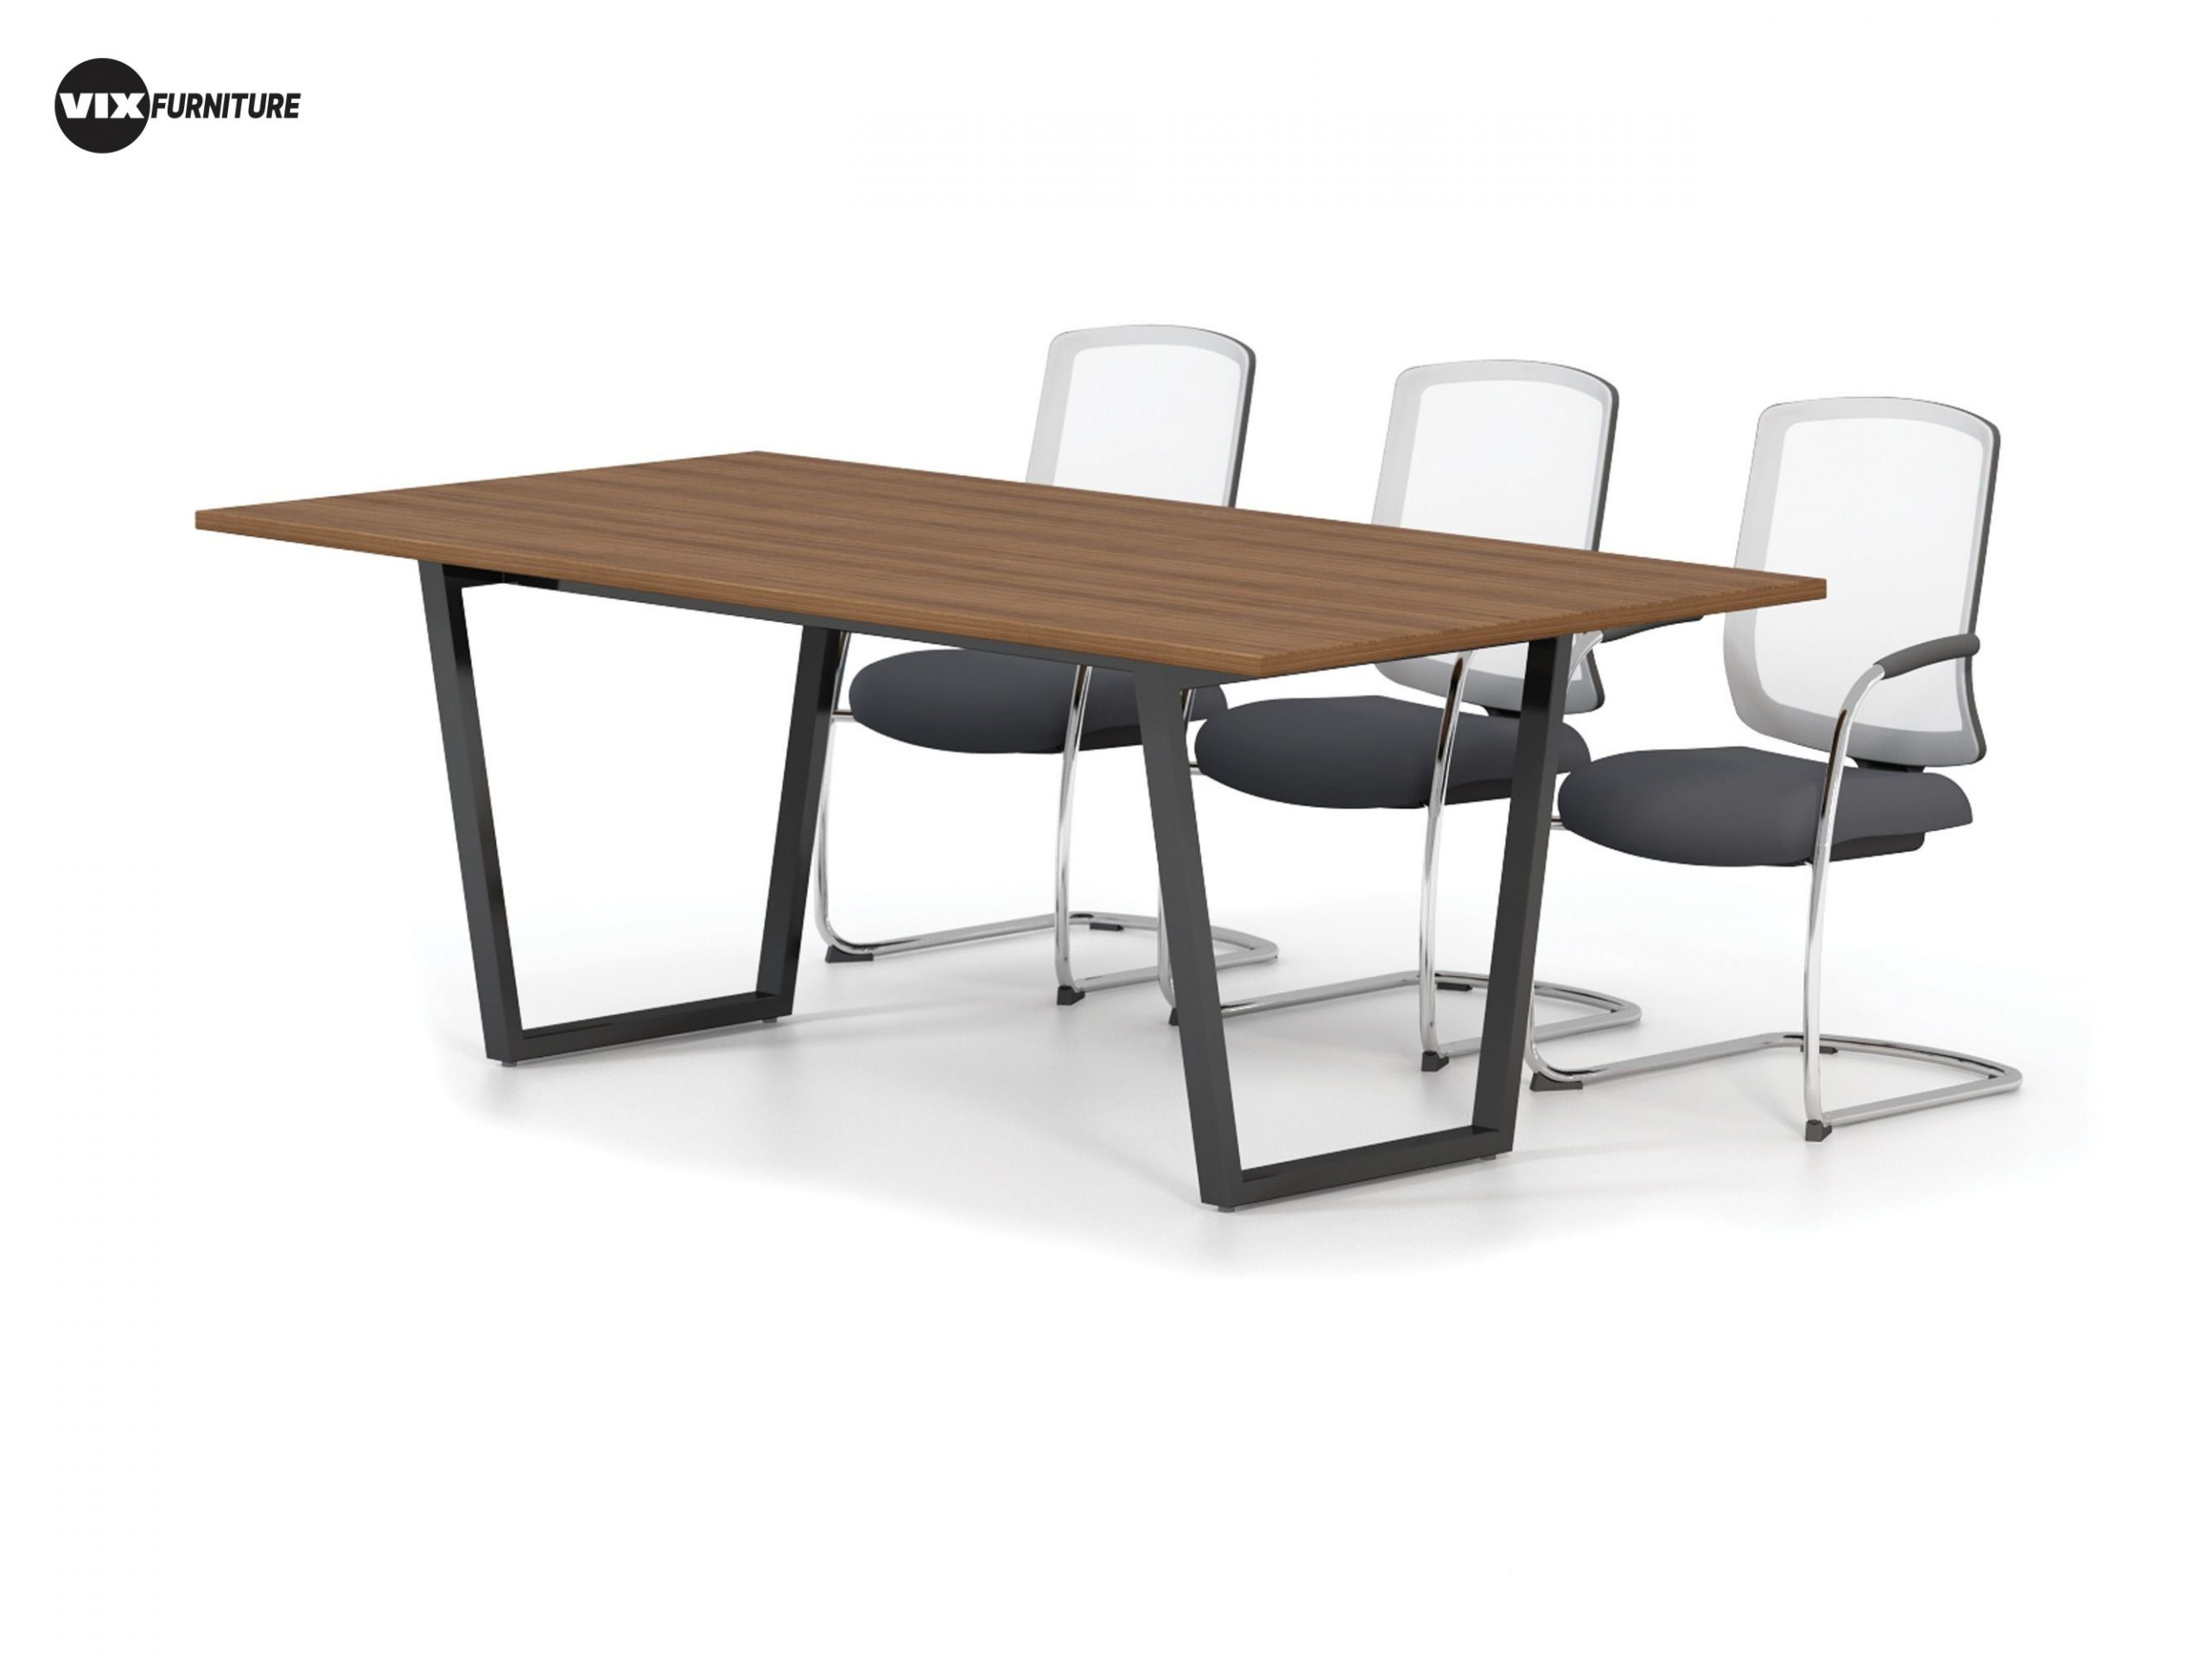 Vix meeting table BH16